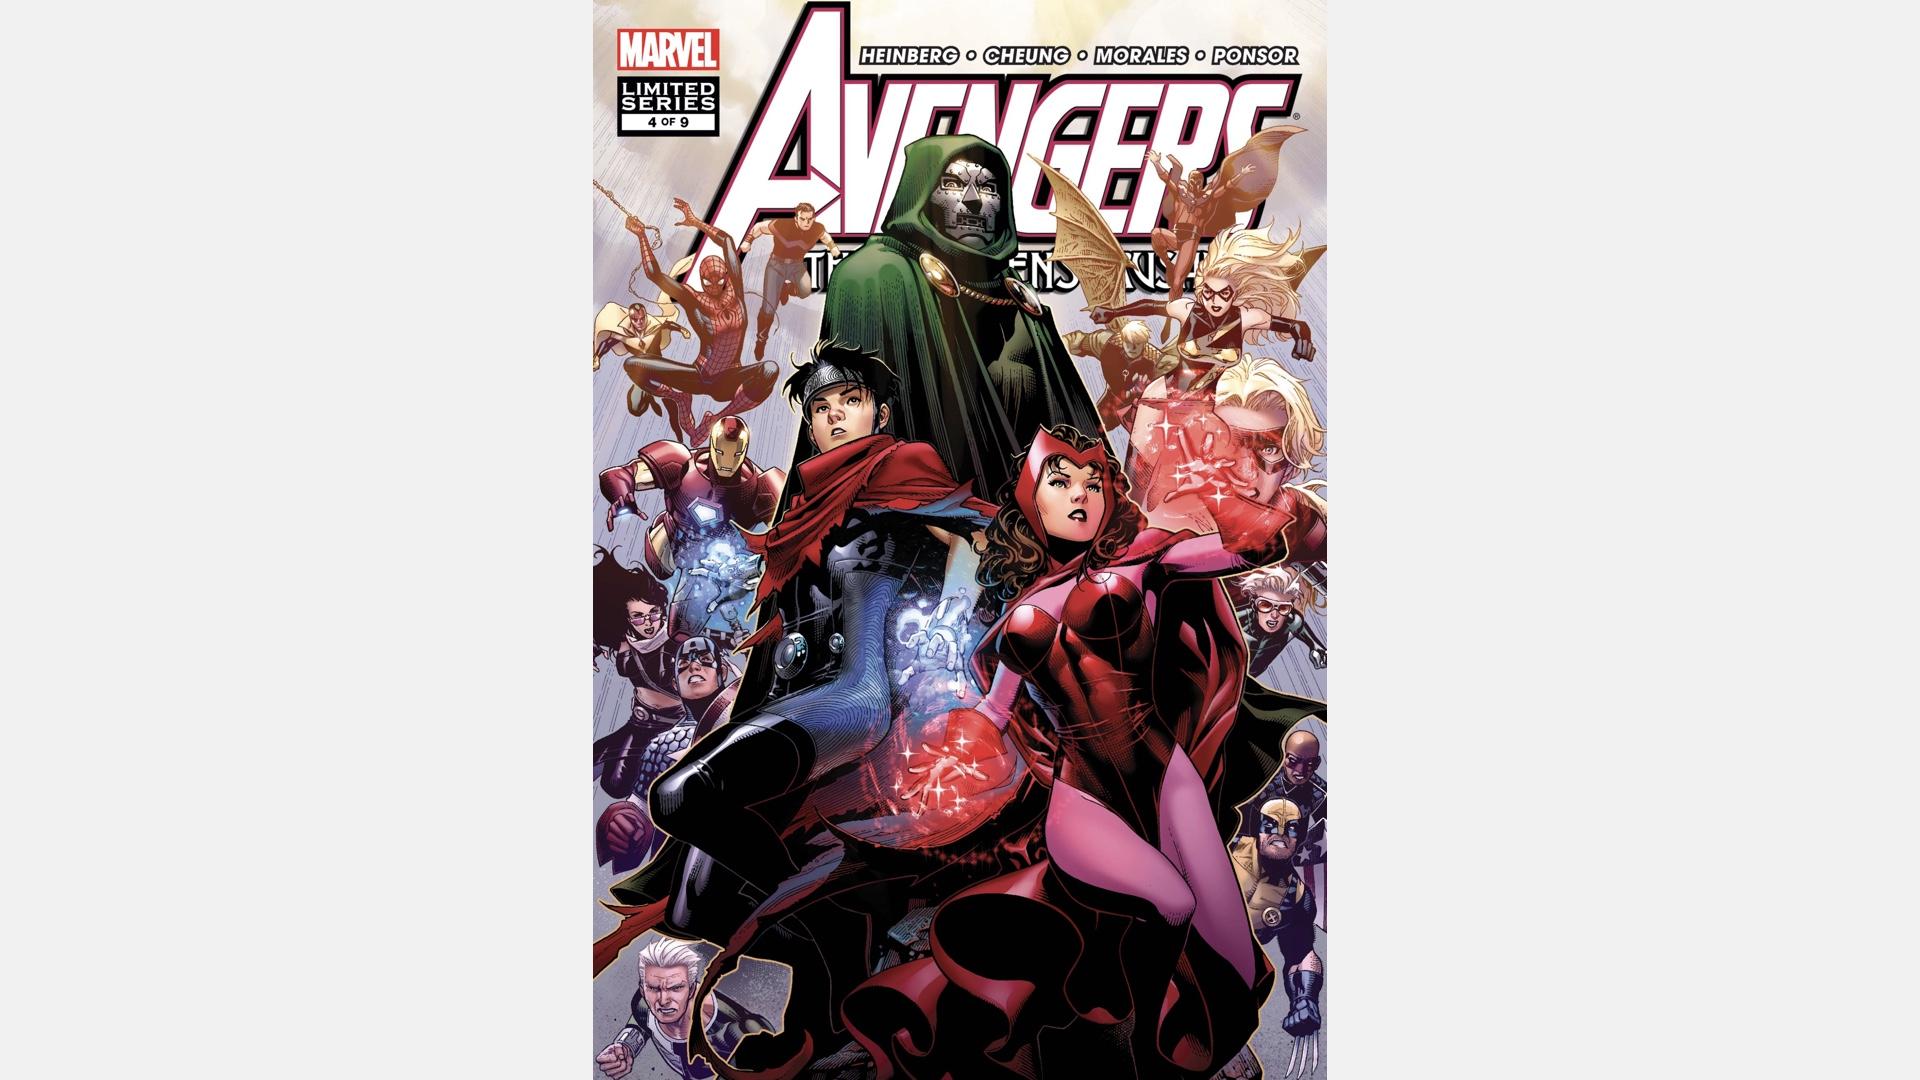 cover of Avengers: The Children's Crusade #4